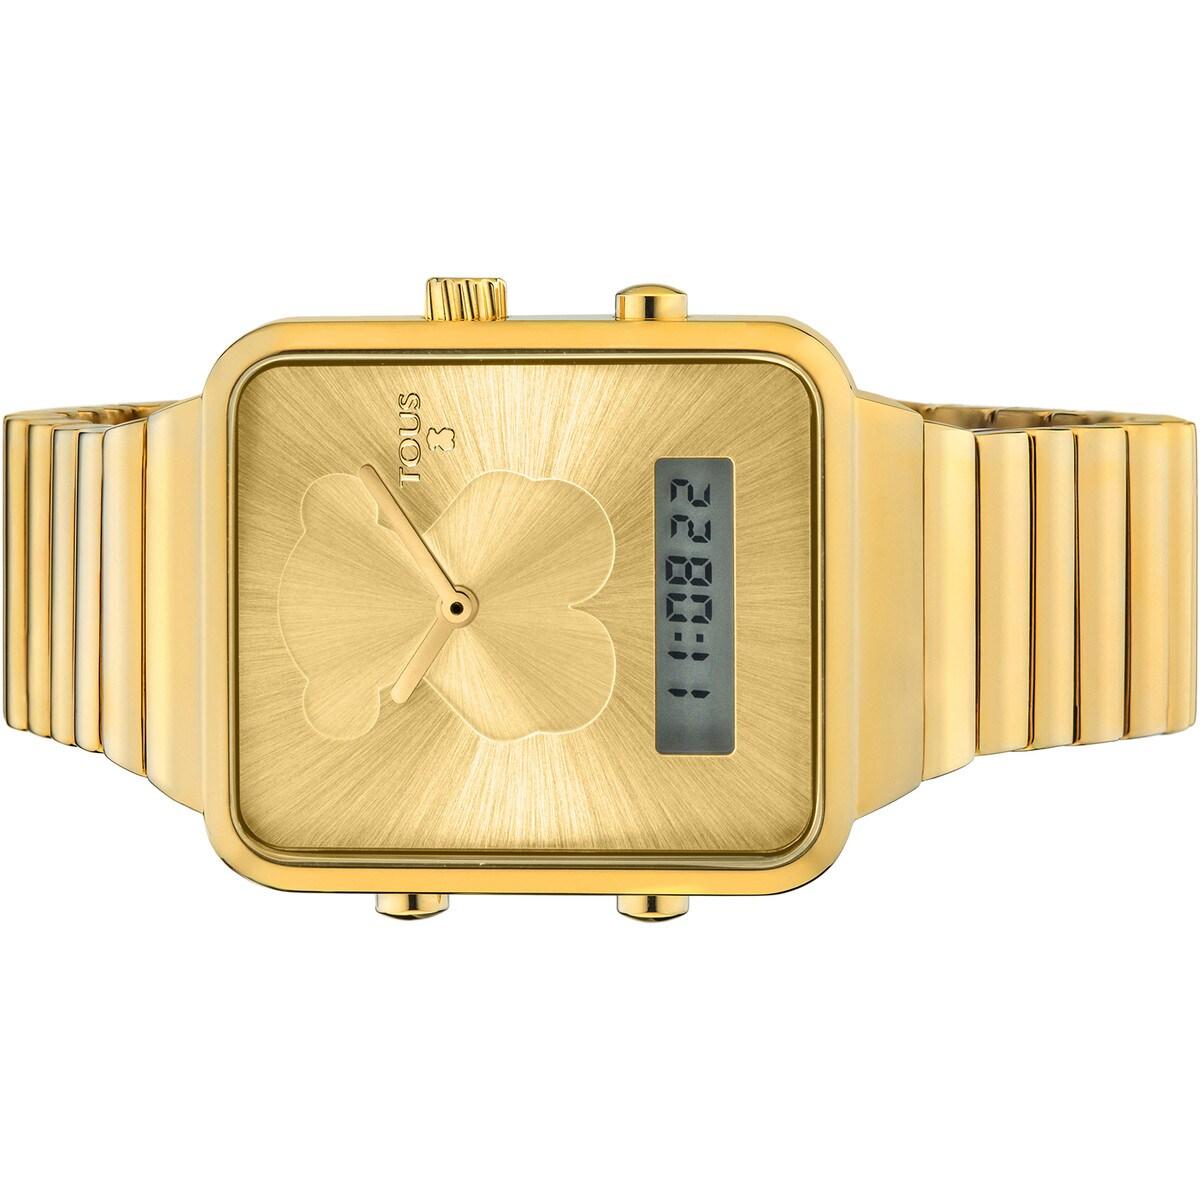 gran descuento 7b5d7 1437c Reloj digital I-Bear de acero IP dorado